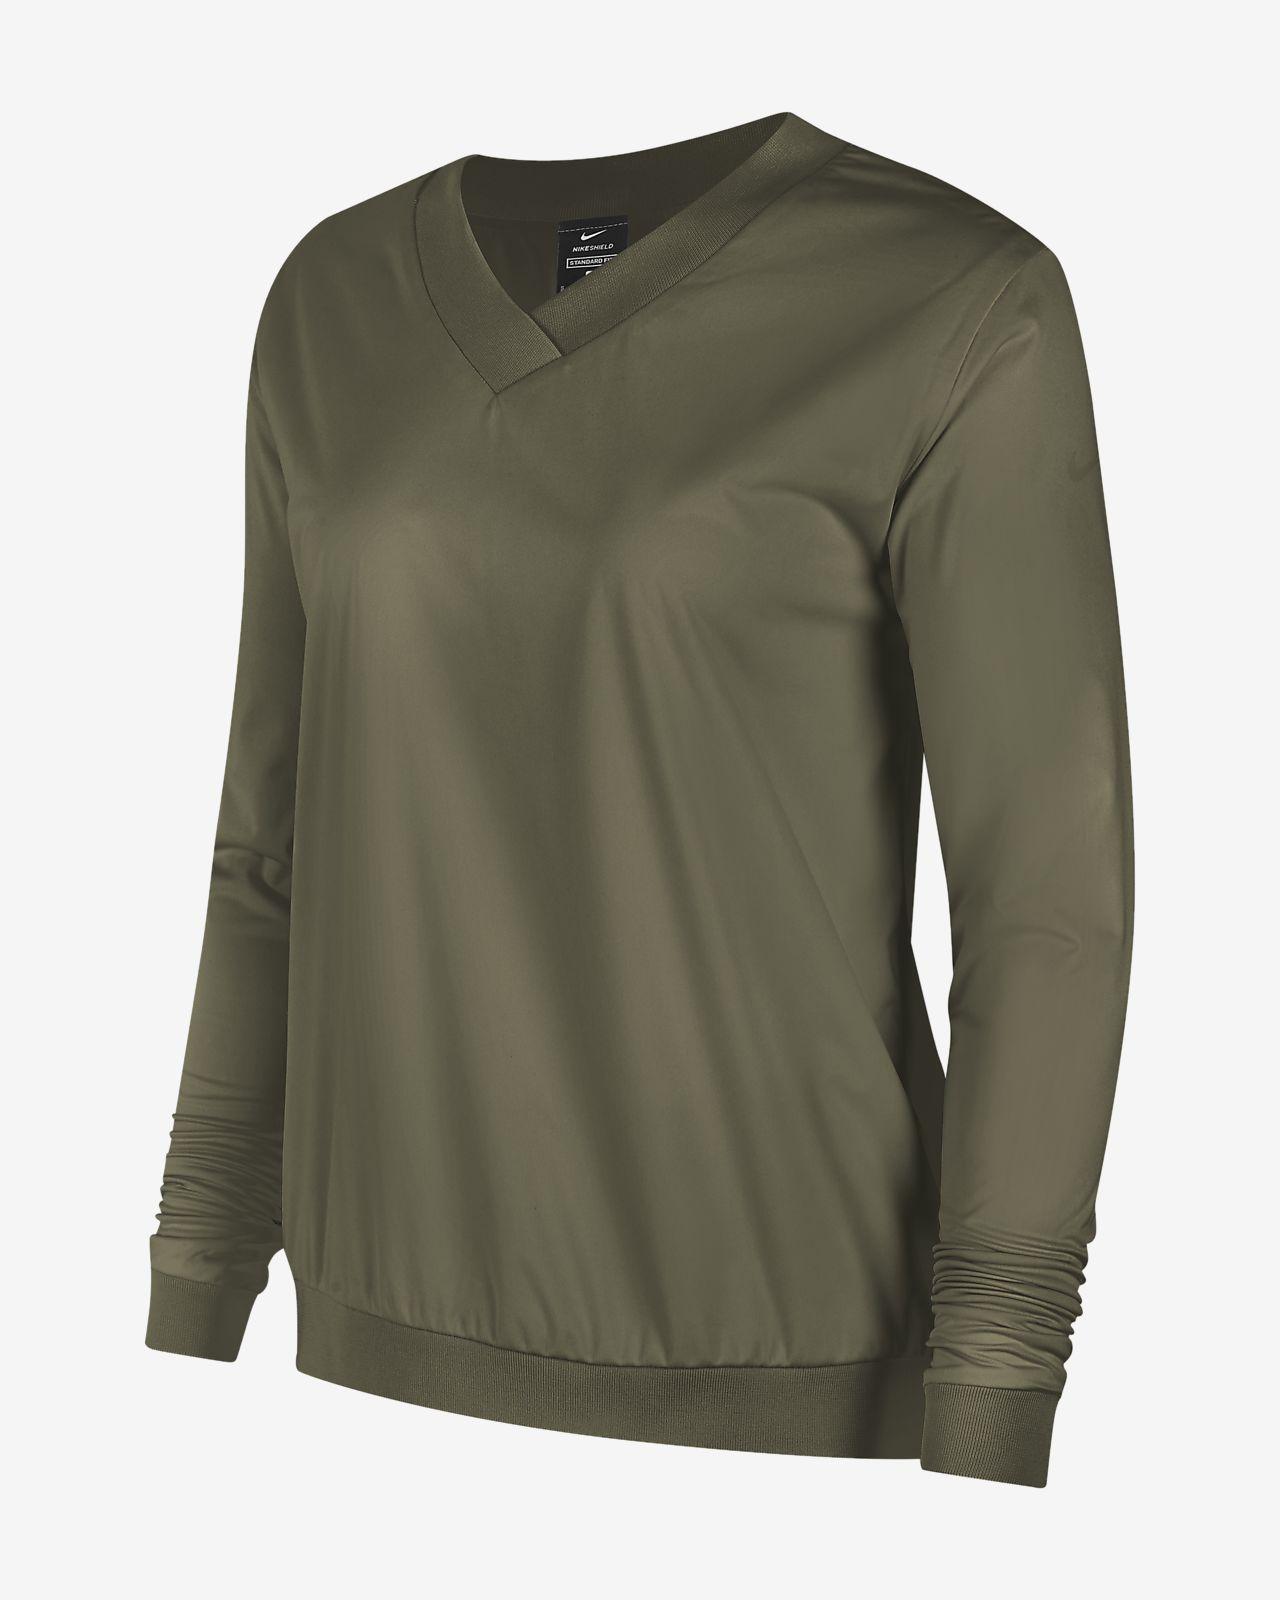 Nike Shield Women's Long-Sleeve Golf Pullover